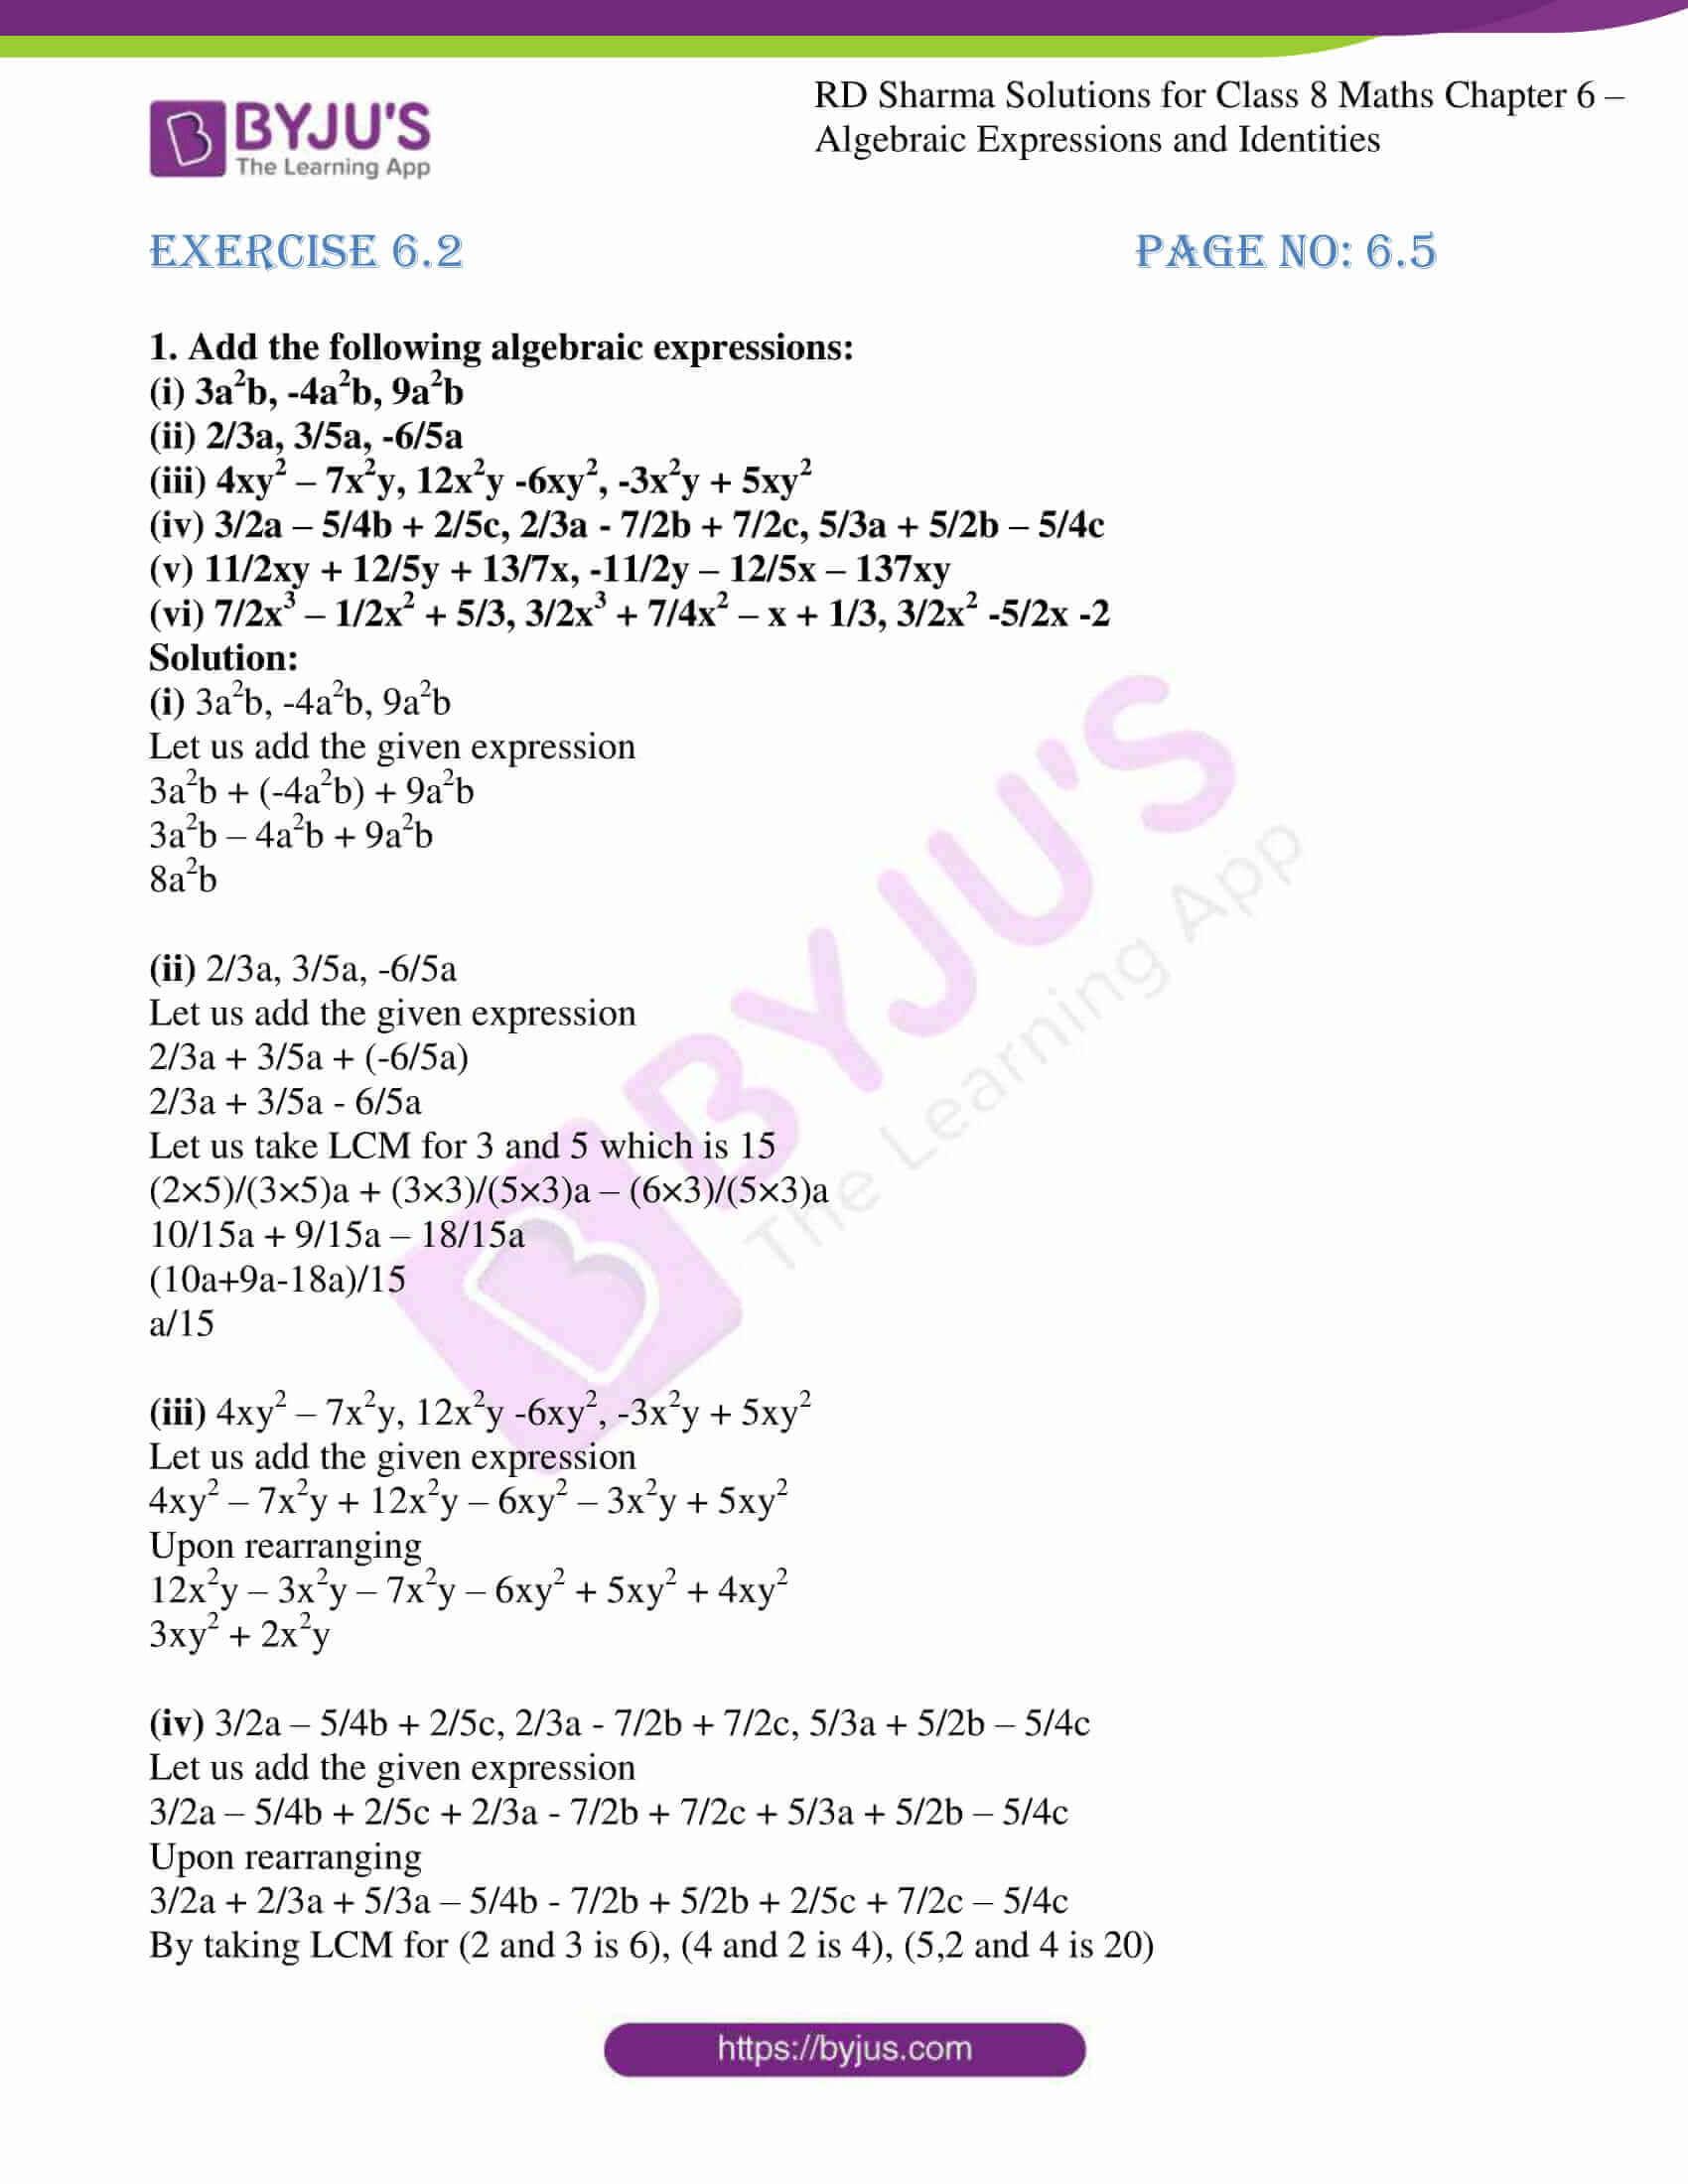 rd sharma class 8 maths chapter 6 exercise 2 1